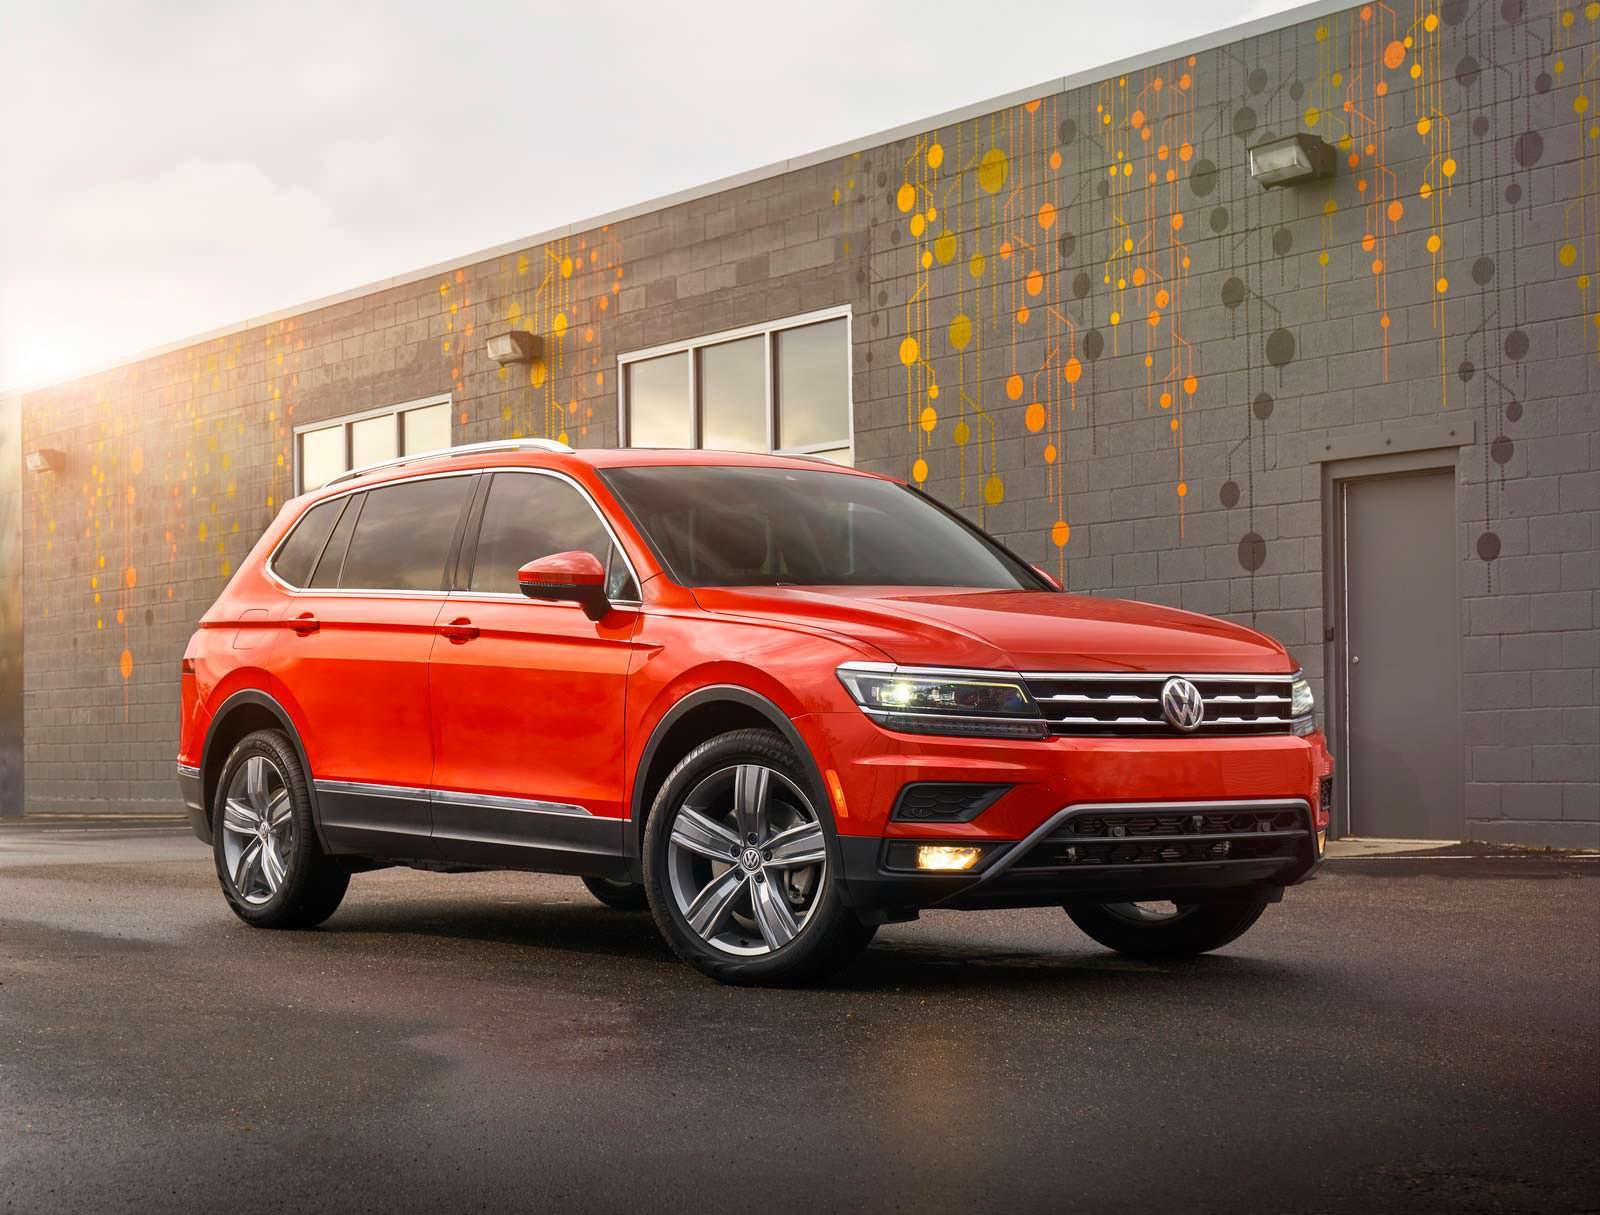 2018 Volkswagen Tiguan в США: продажи летом